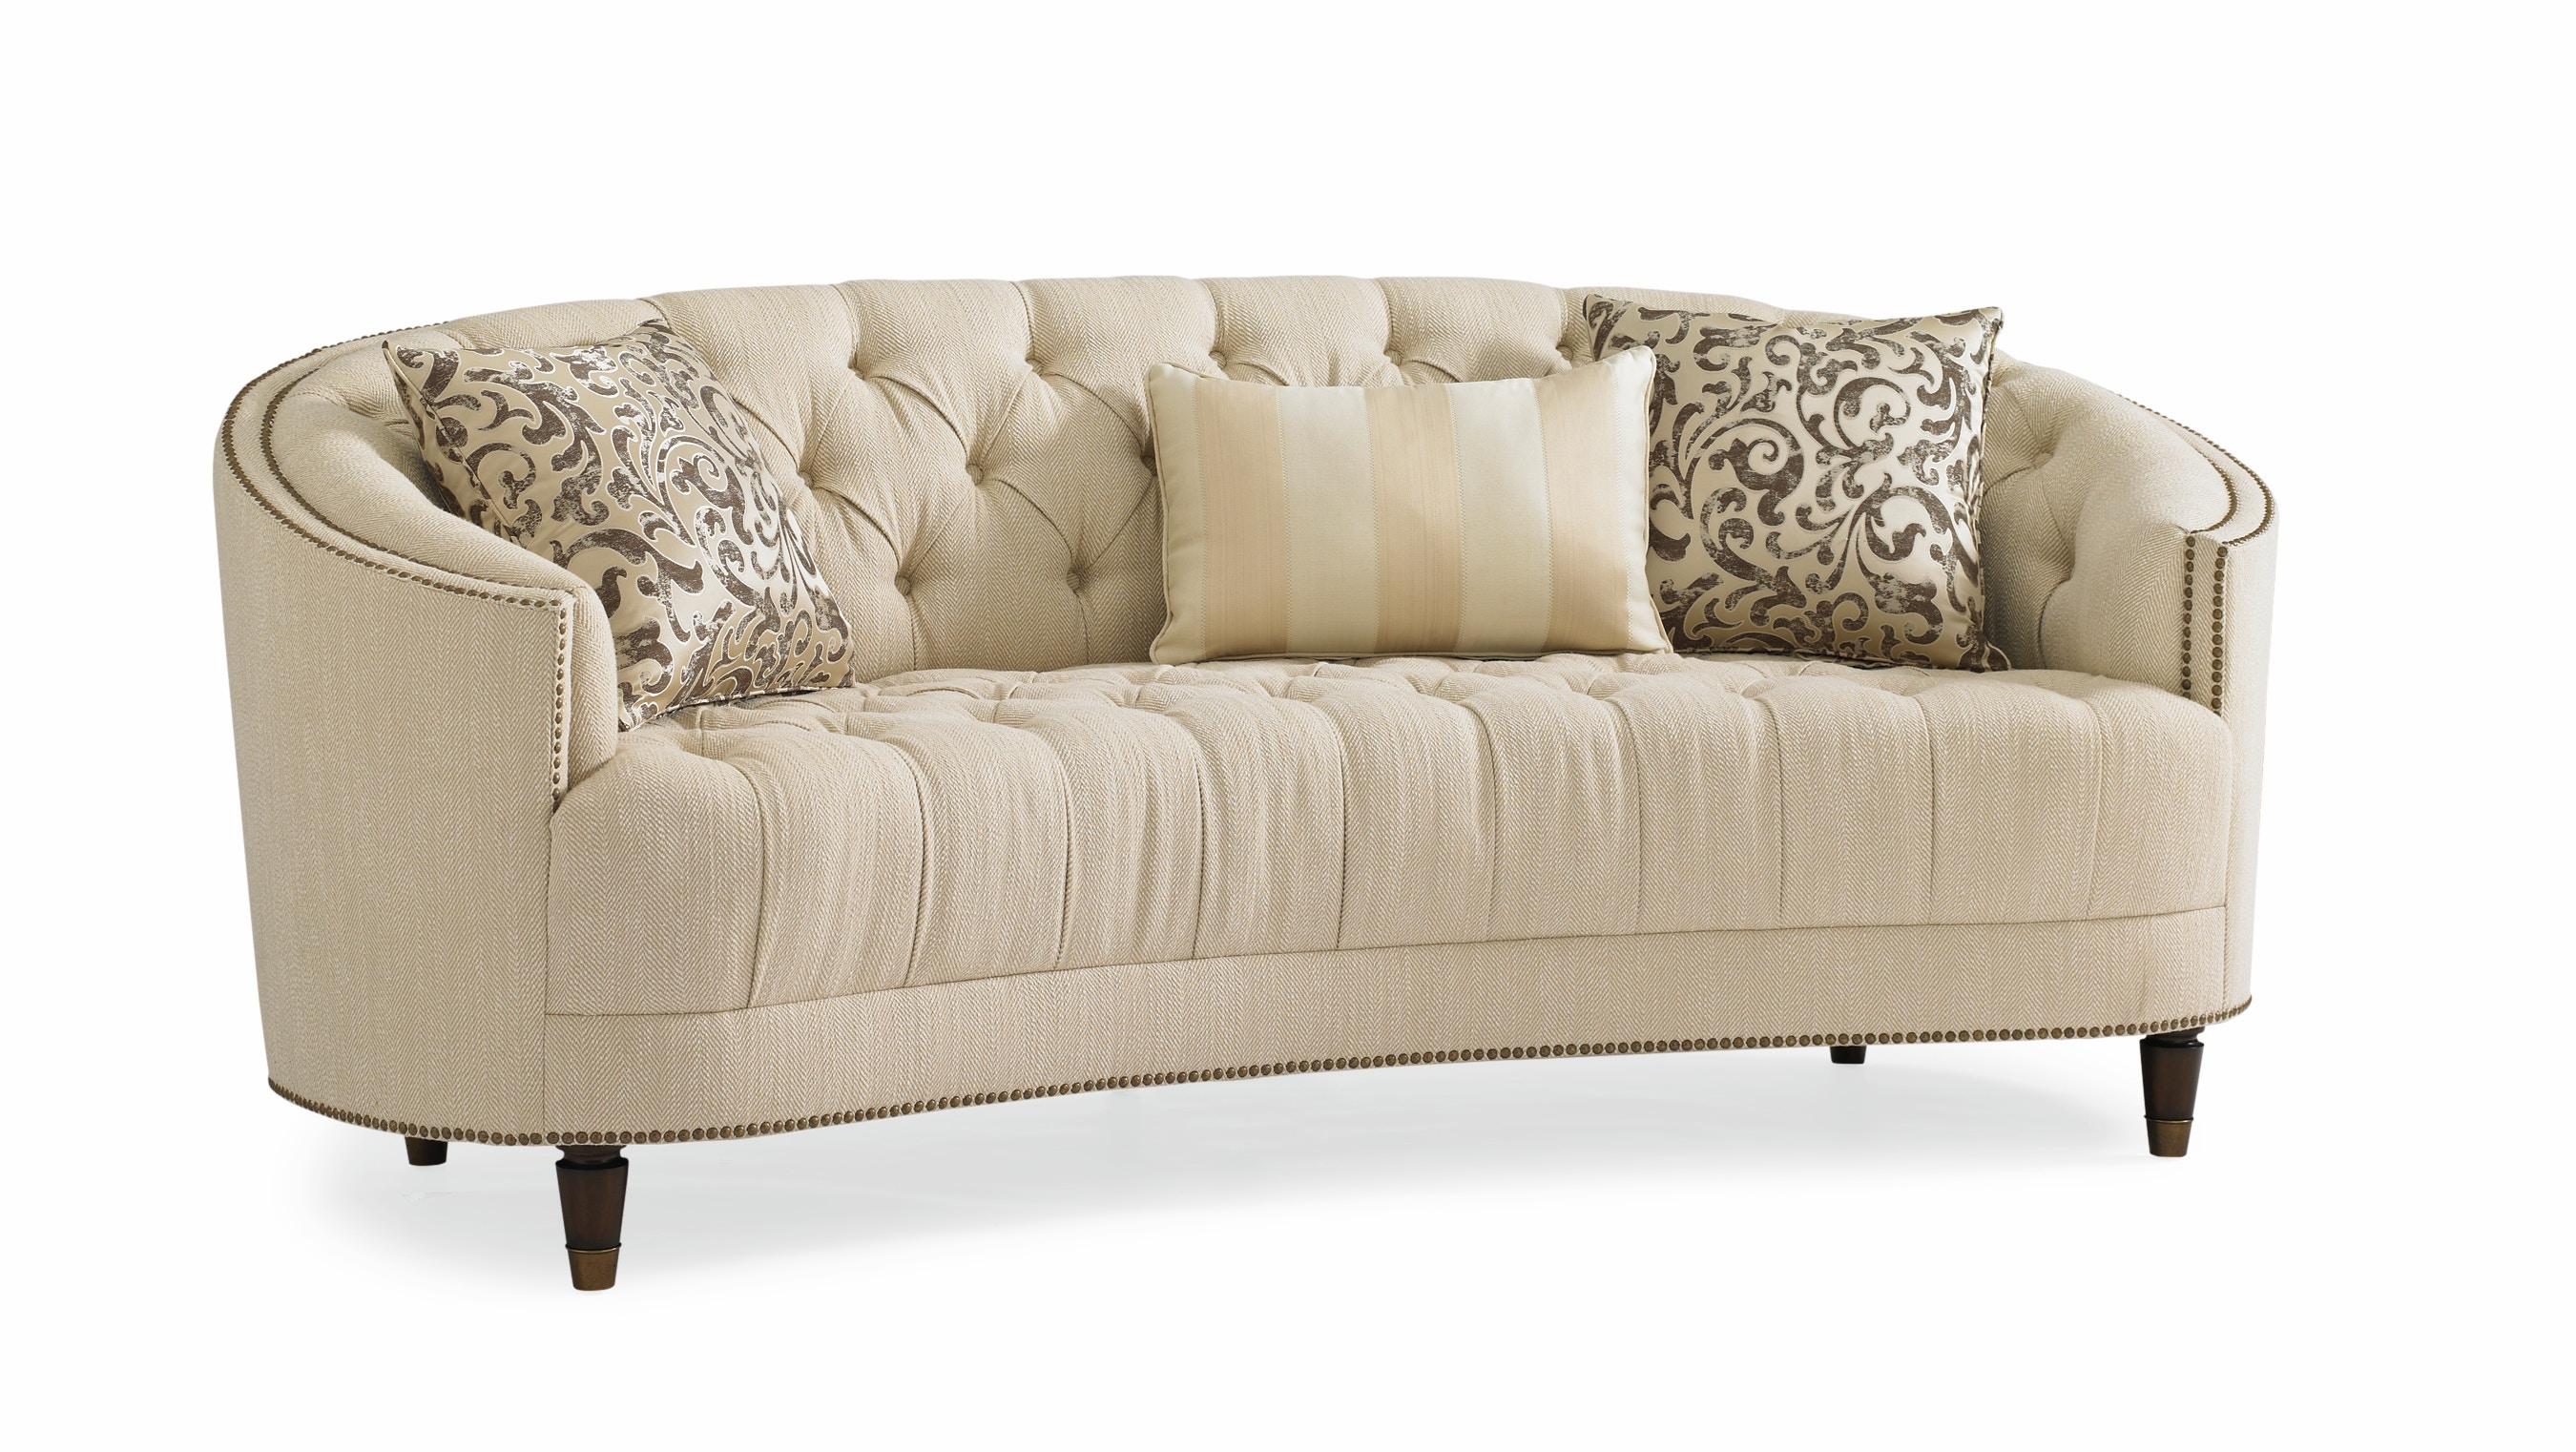 Schnadig Sofa 9090 182 G